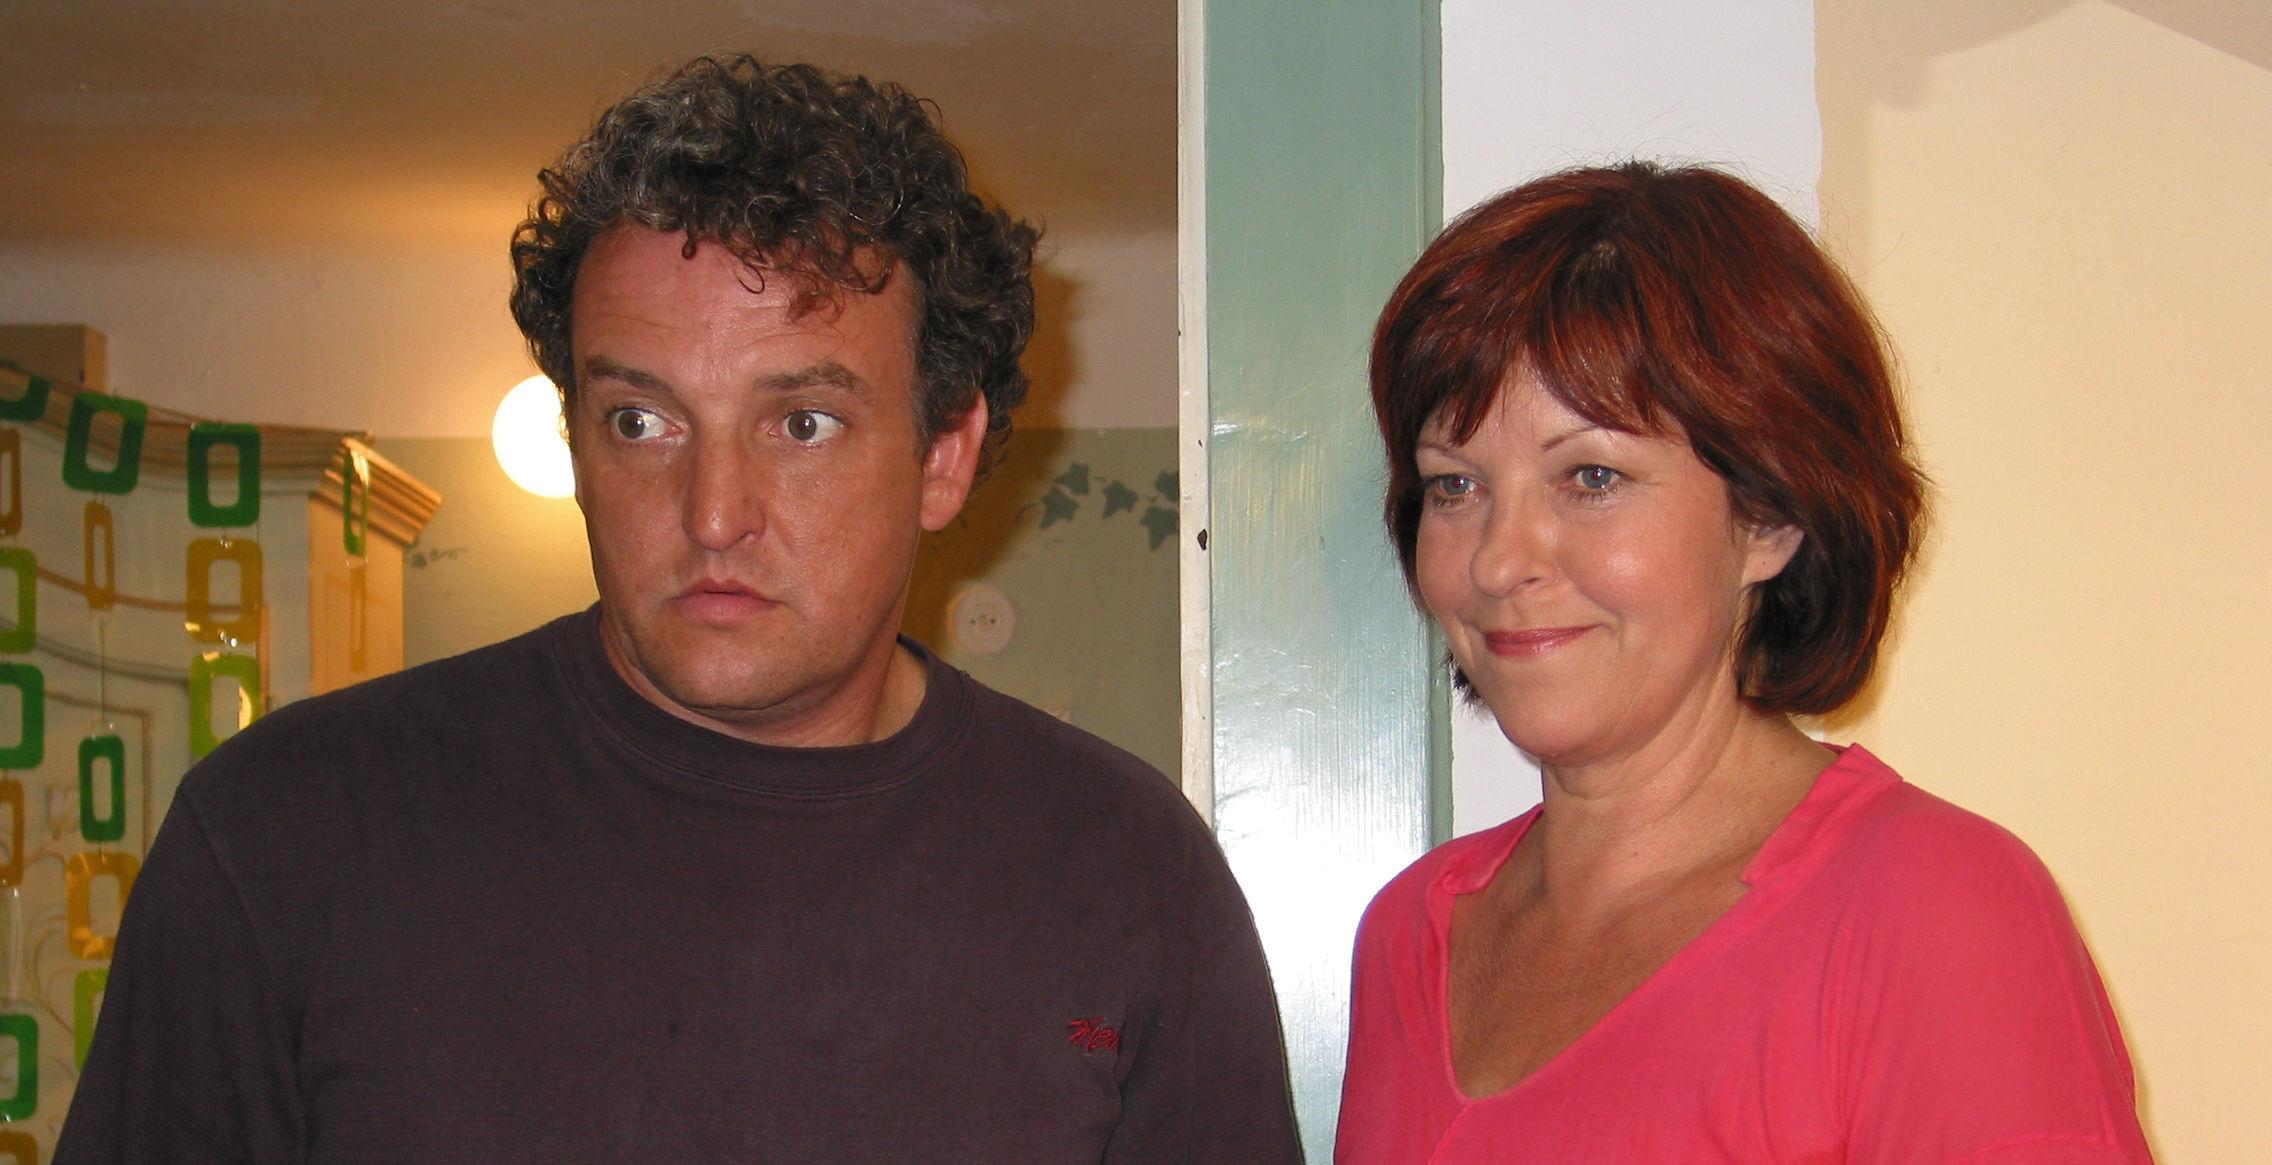 Freddy (Marco Rima), Conny (Elfi Eschke)